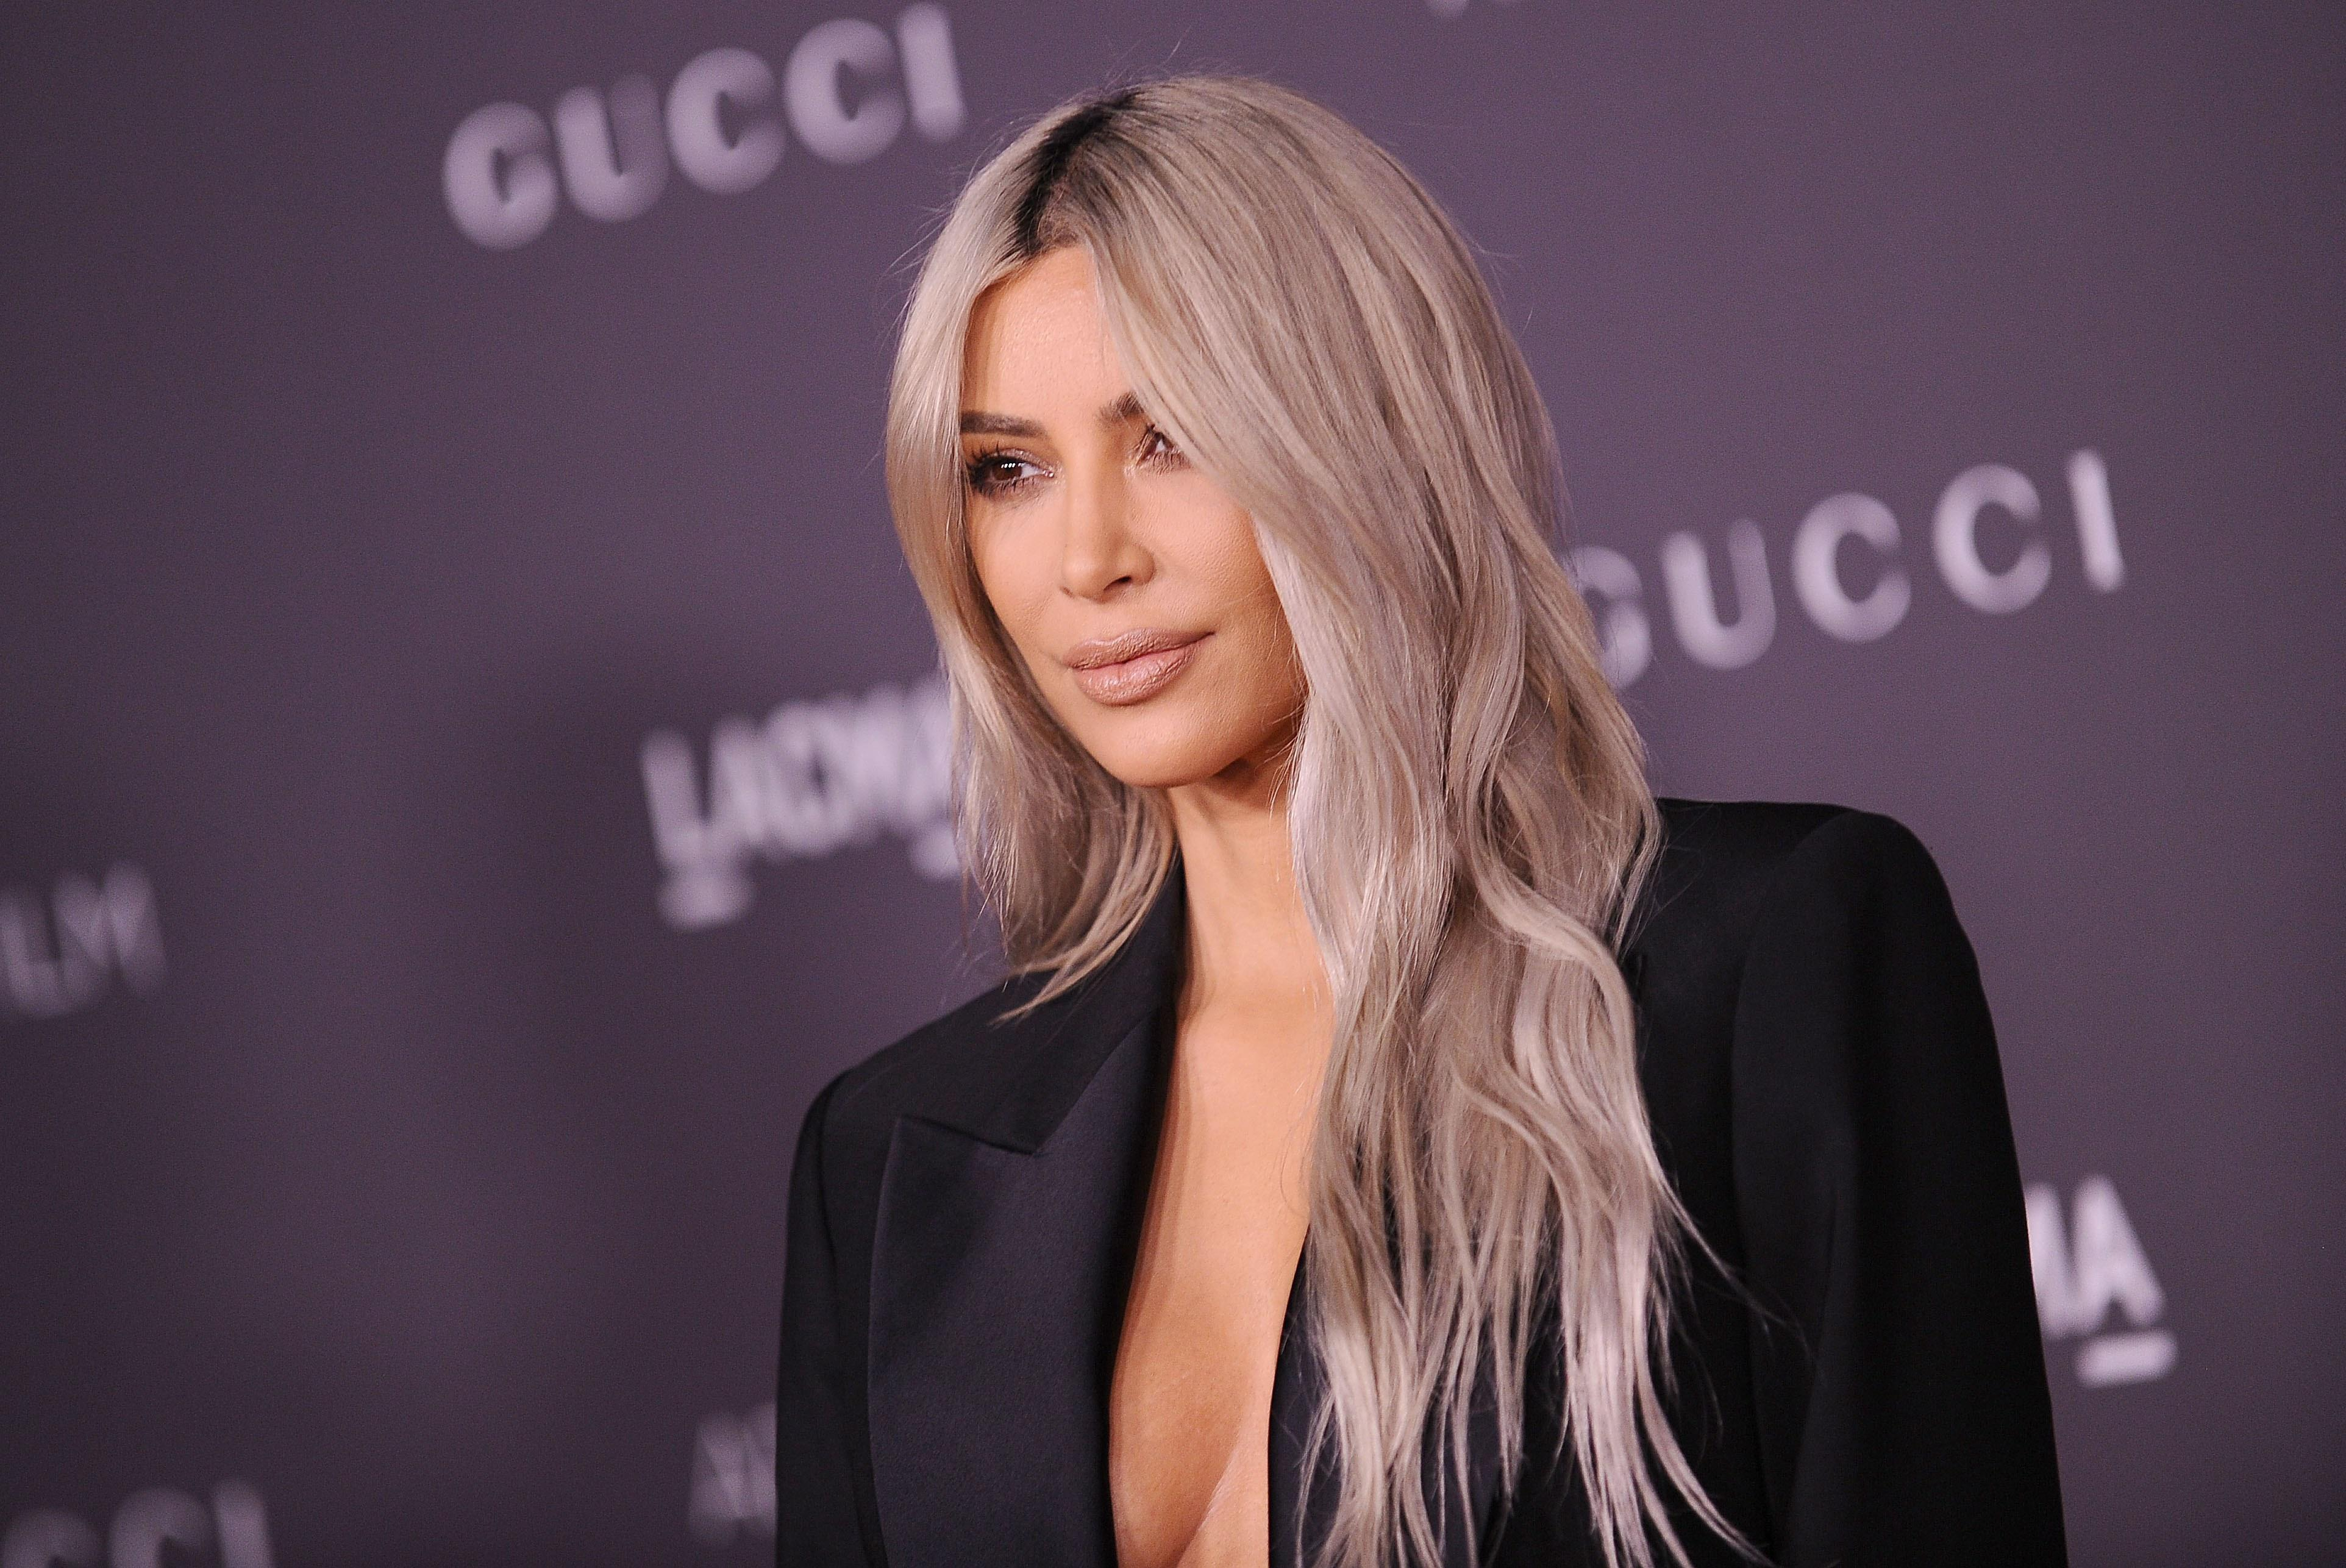 Kim Kardashian Wedding Gift: Kim Kardashian Dyed Her Hair As A Wedding Anniversary Gift